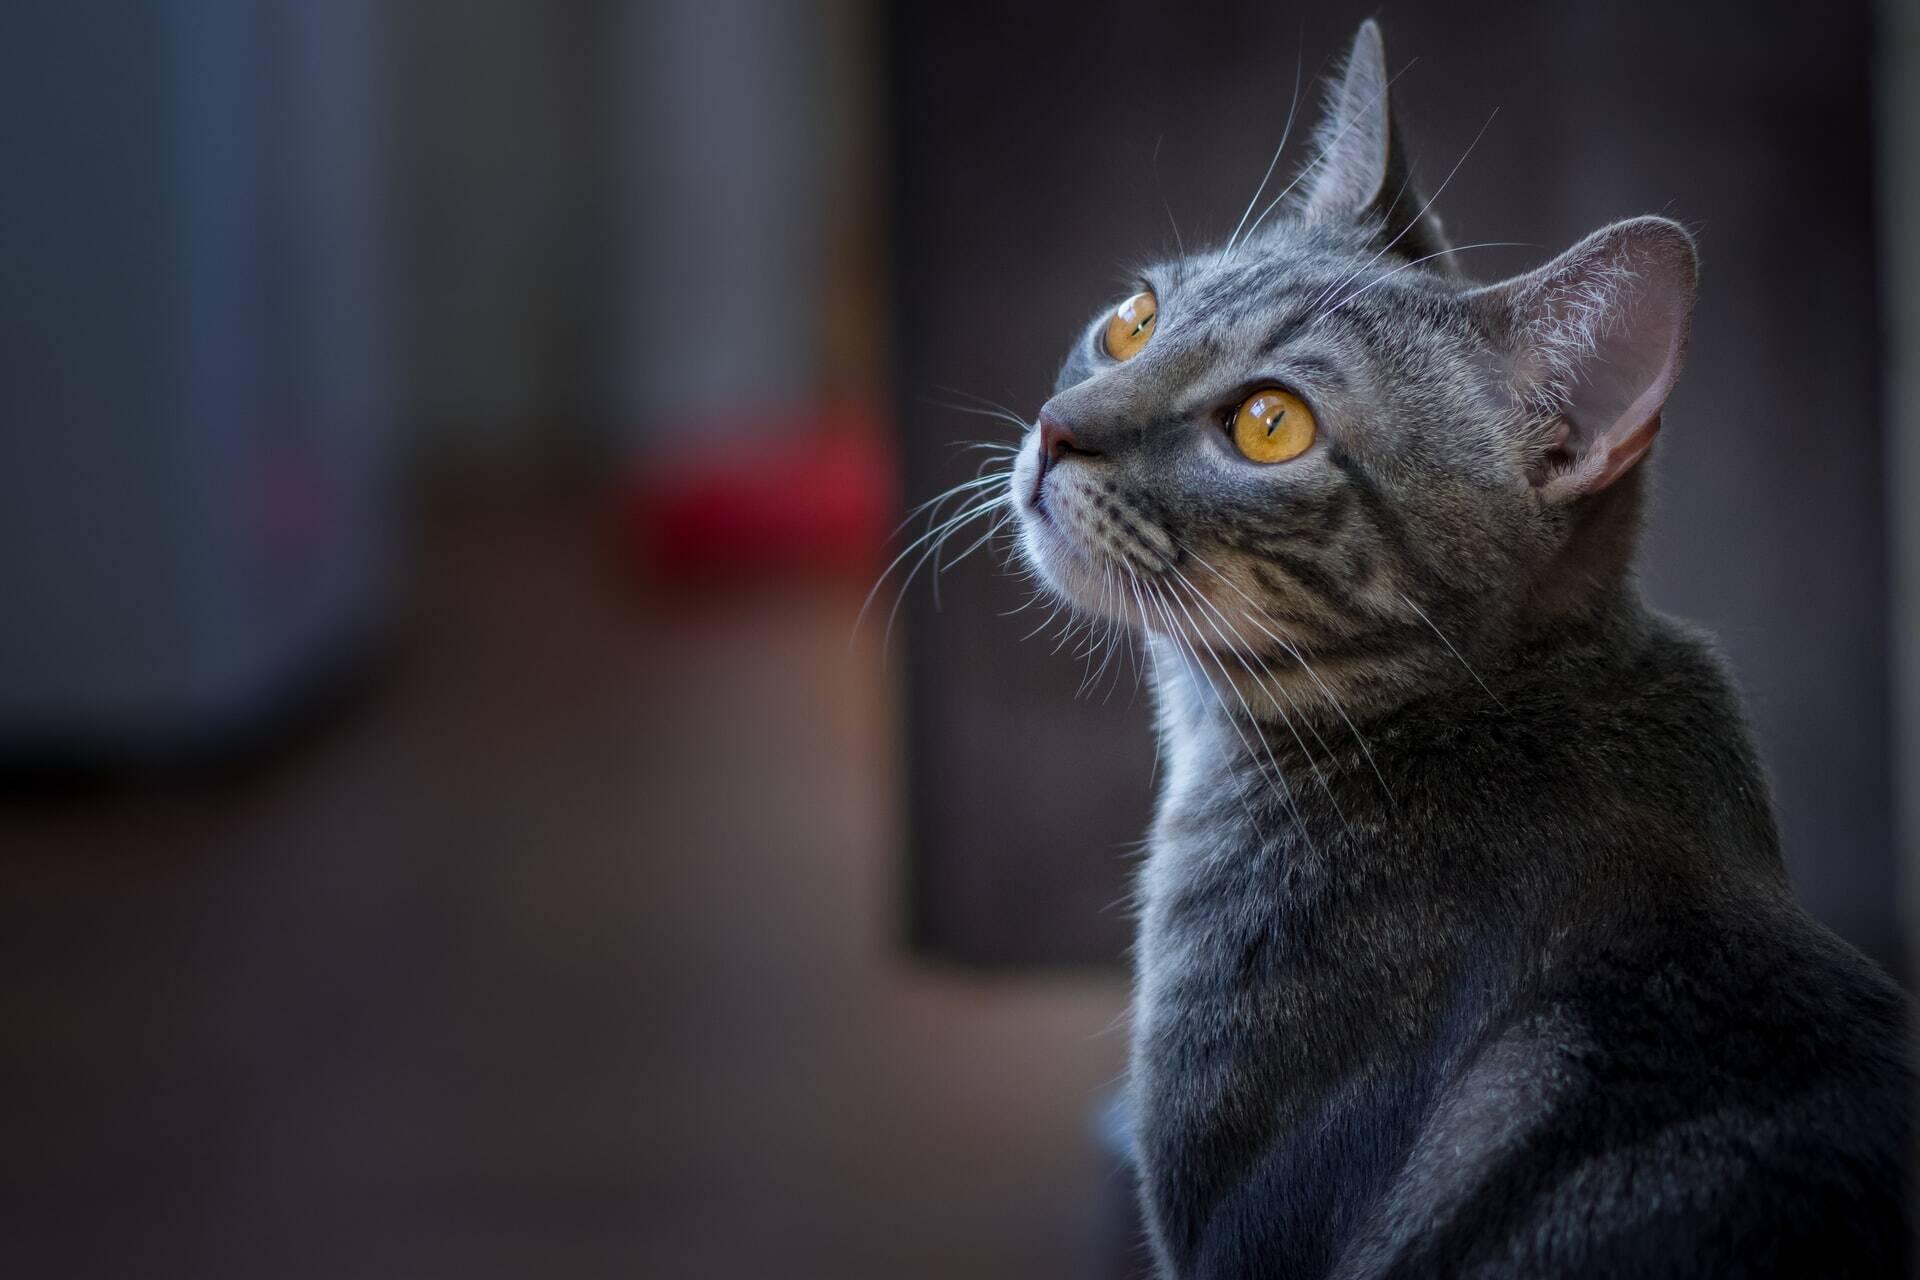 Seu gato está miando demais? Saiba o que fazer